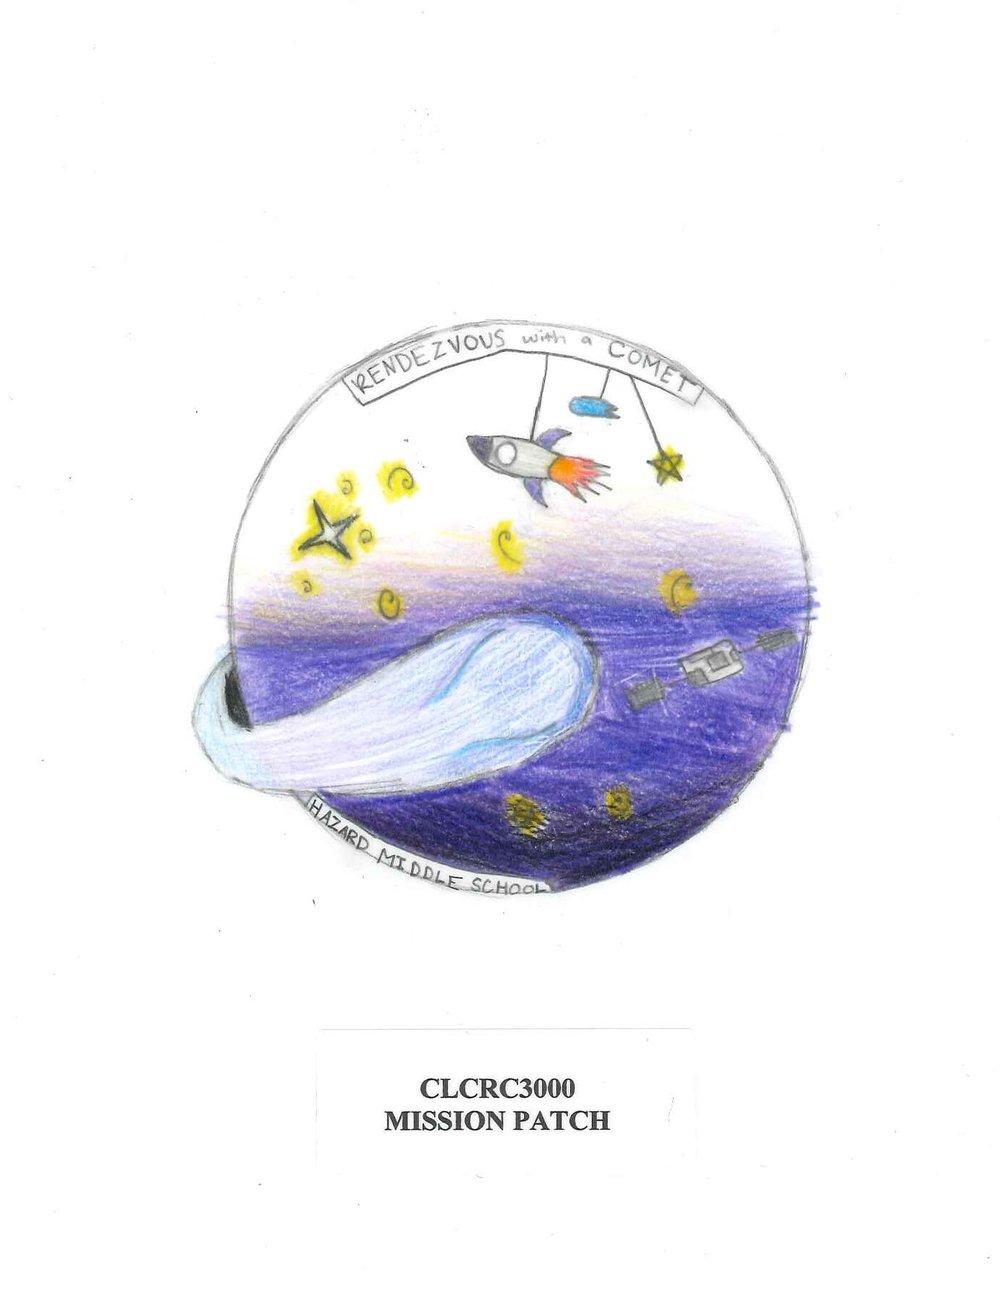 CLCRC3000 Mission Patch.jpg